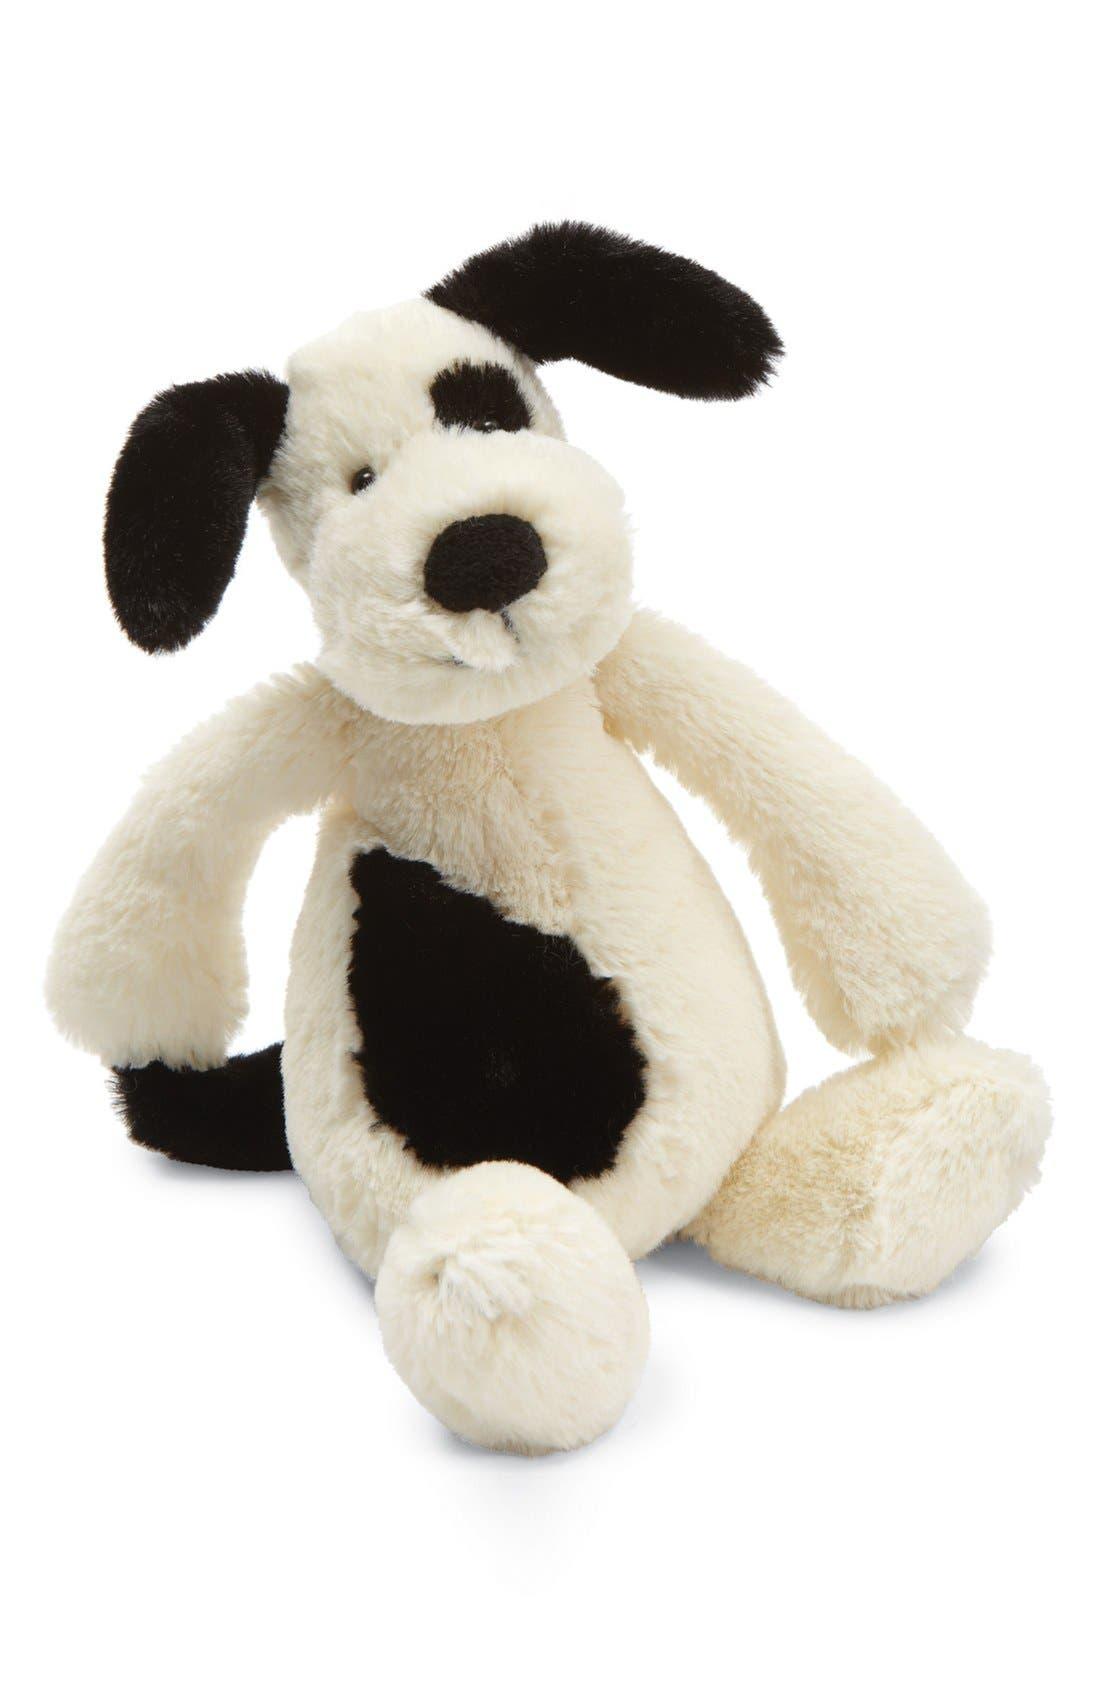 'Small Bashful Puppy' Stuffed Animal,                             Alternate thumbnail 3, color,                             CREAM